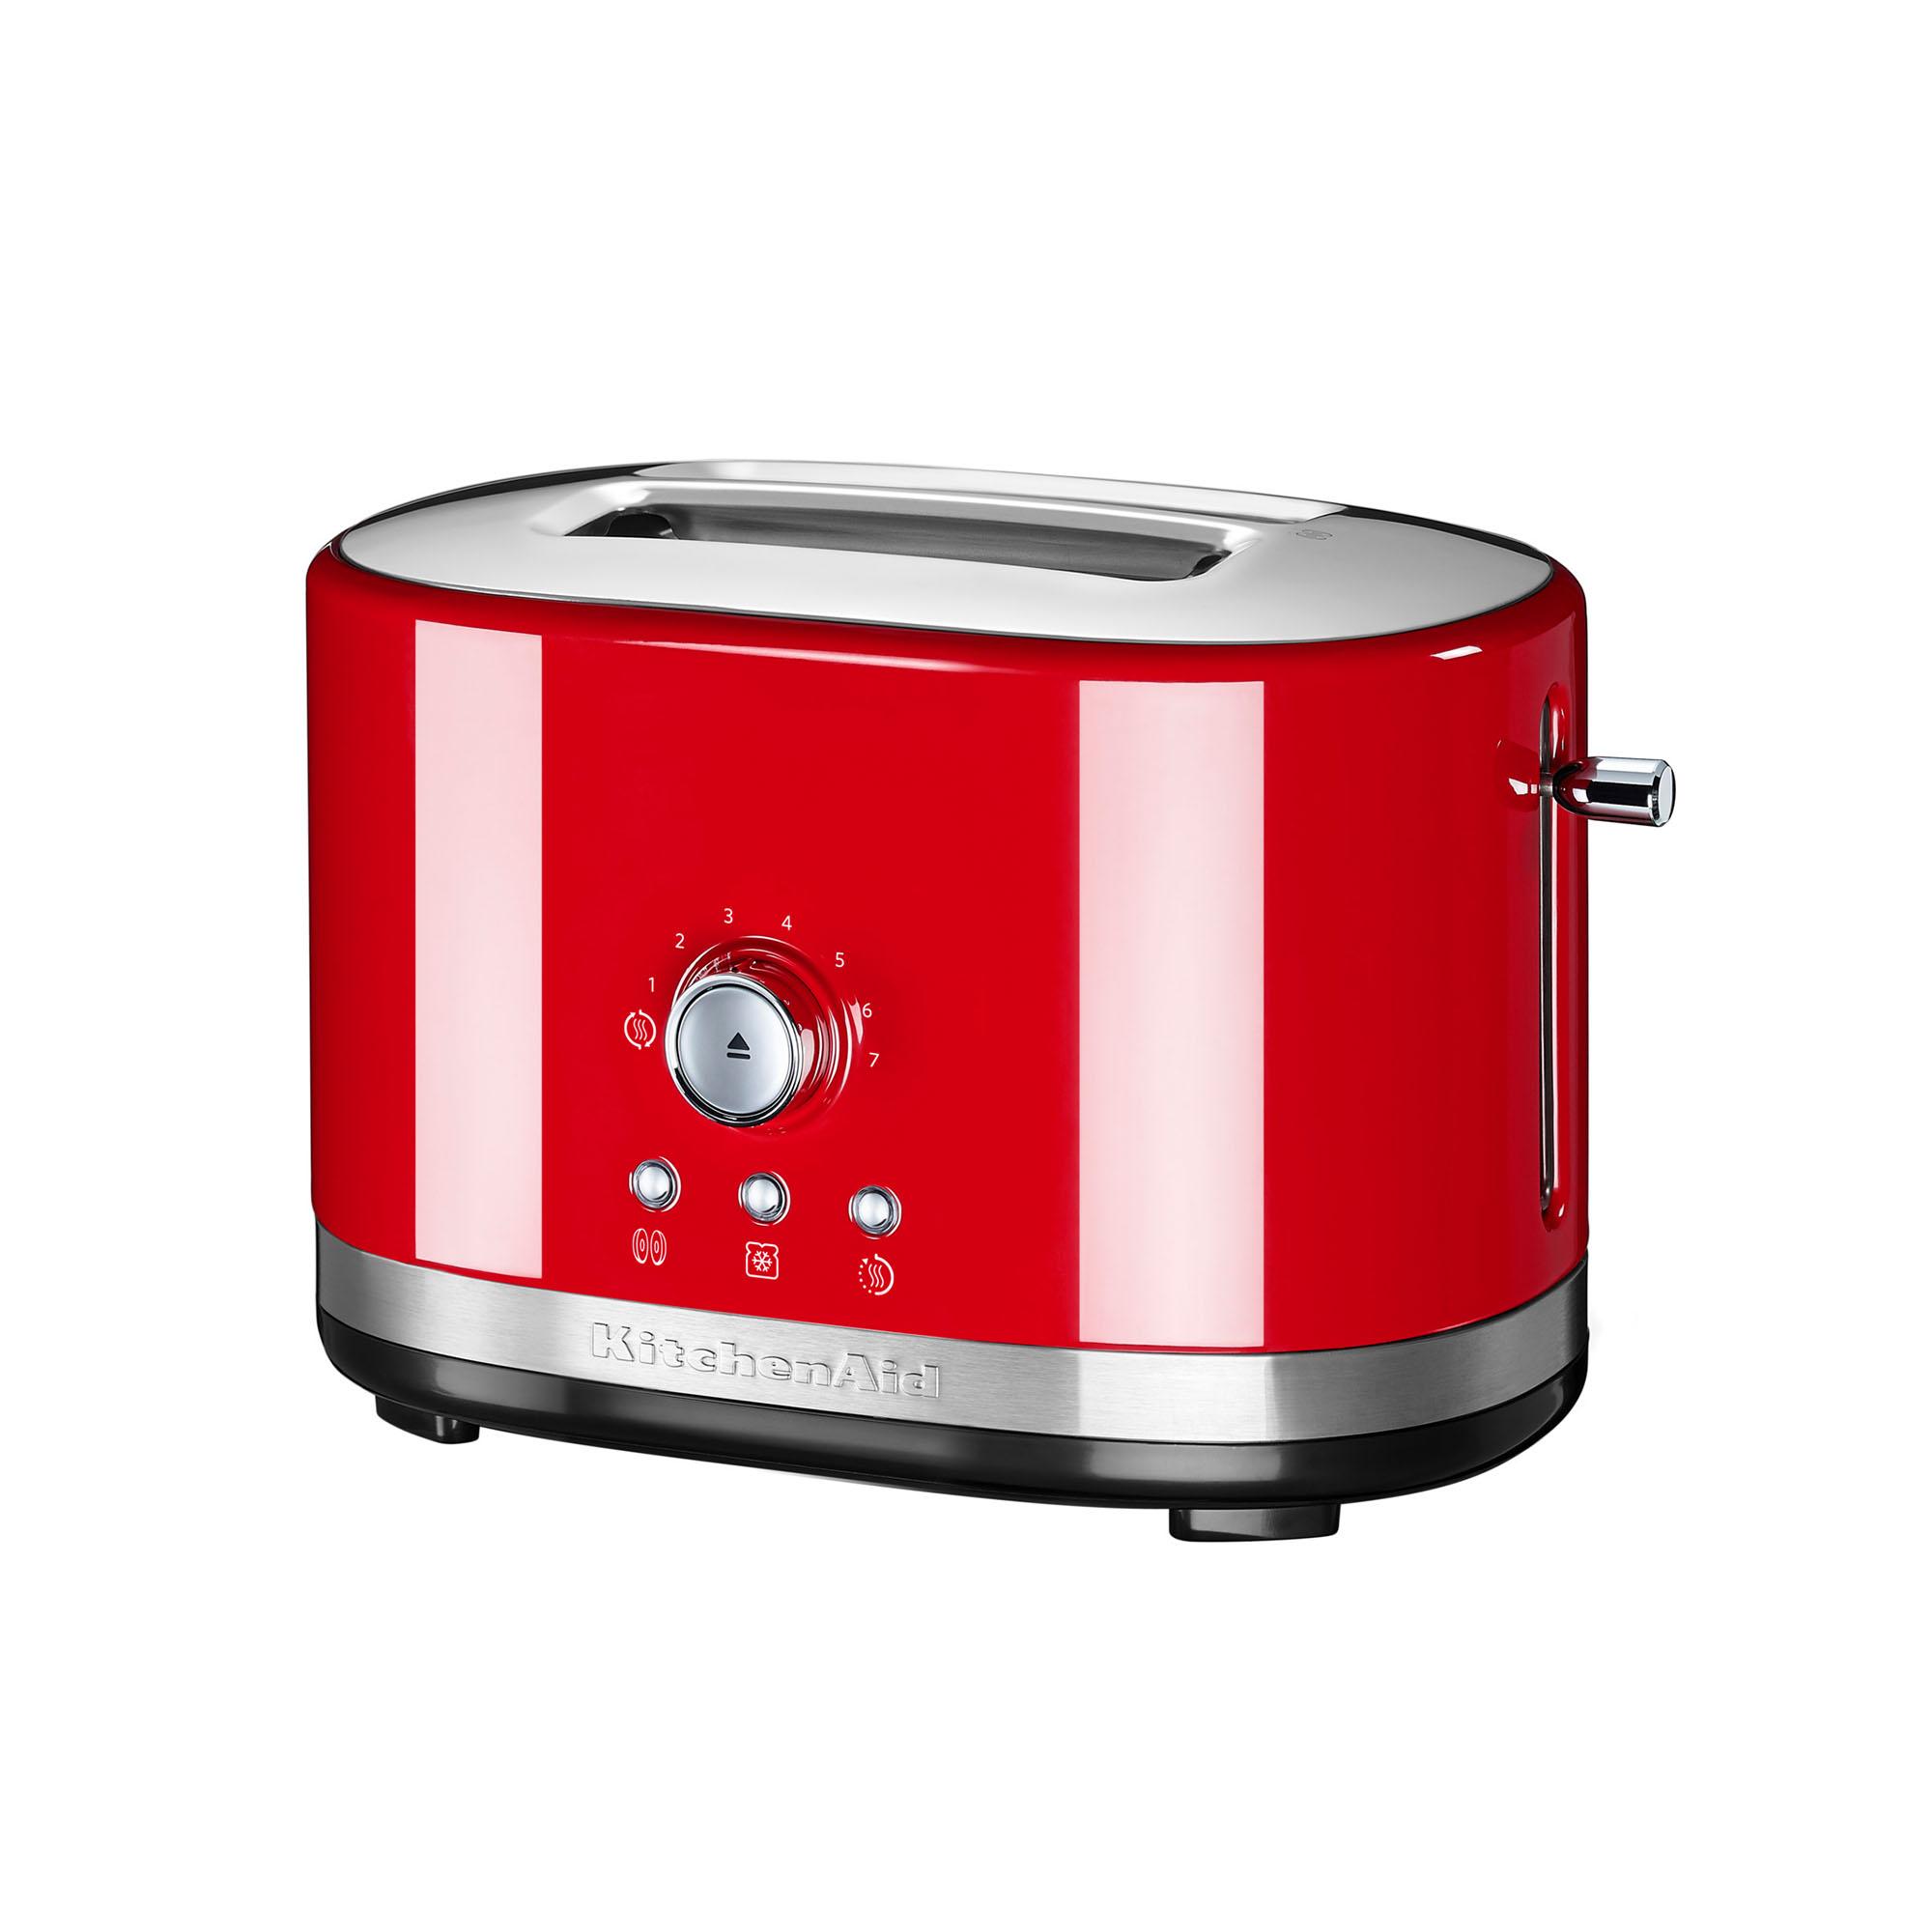 kitchenaid toaster kitchen aid kurzschlitz 5kmt2116. Black Bedroom Furniture Sets. Home Design Ideas